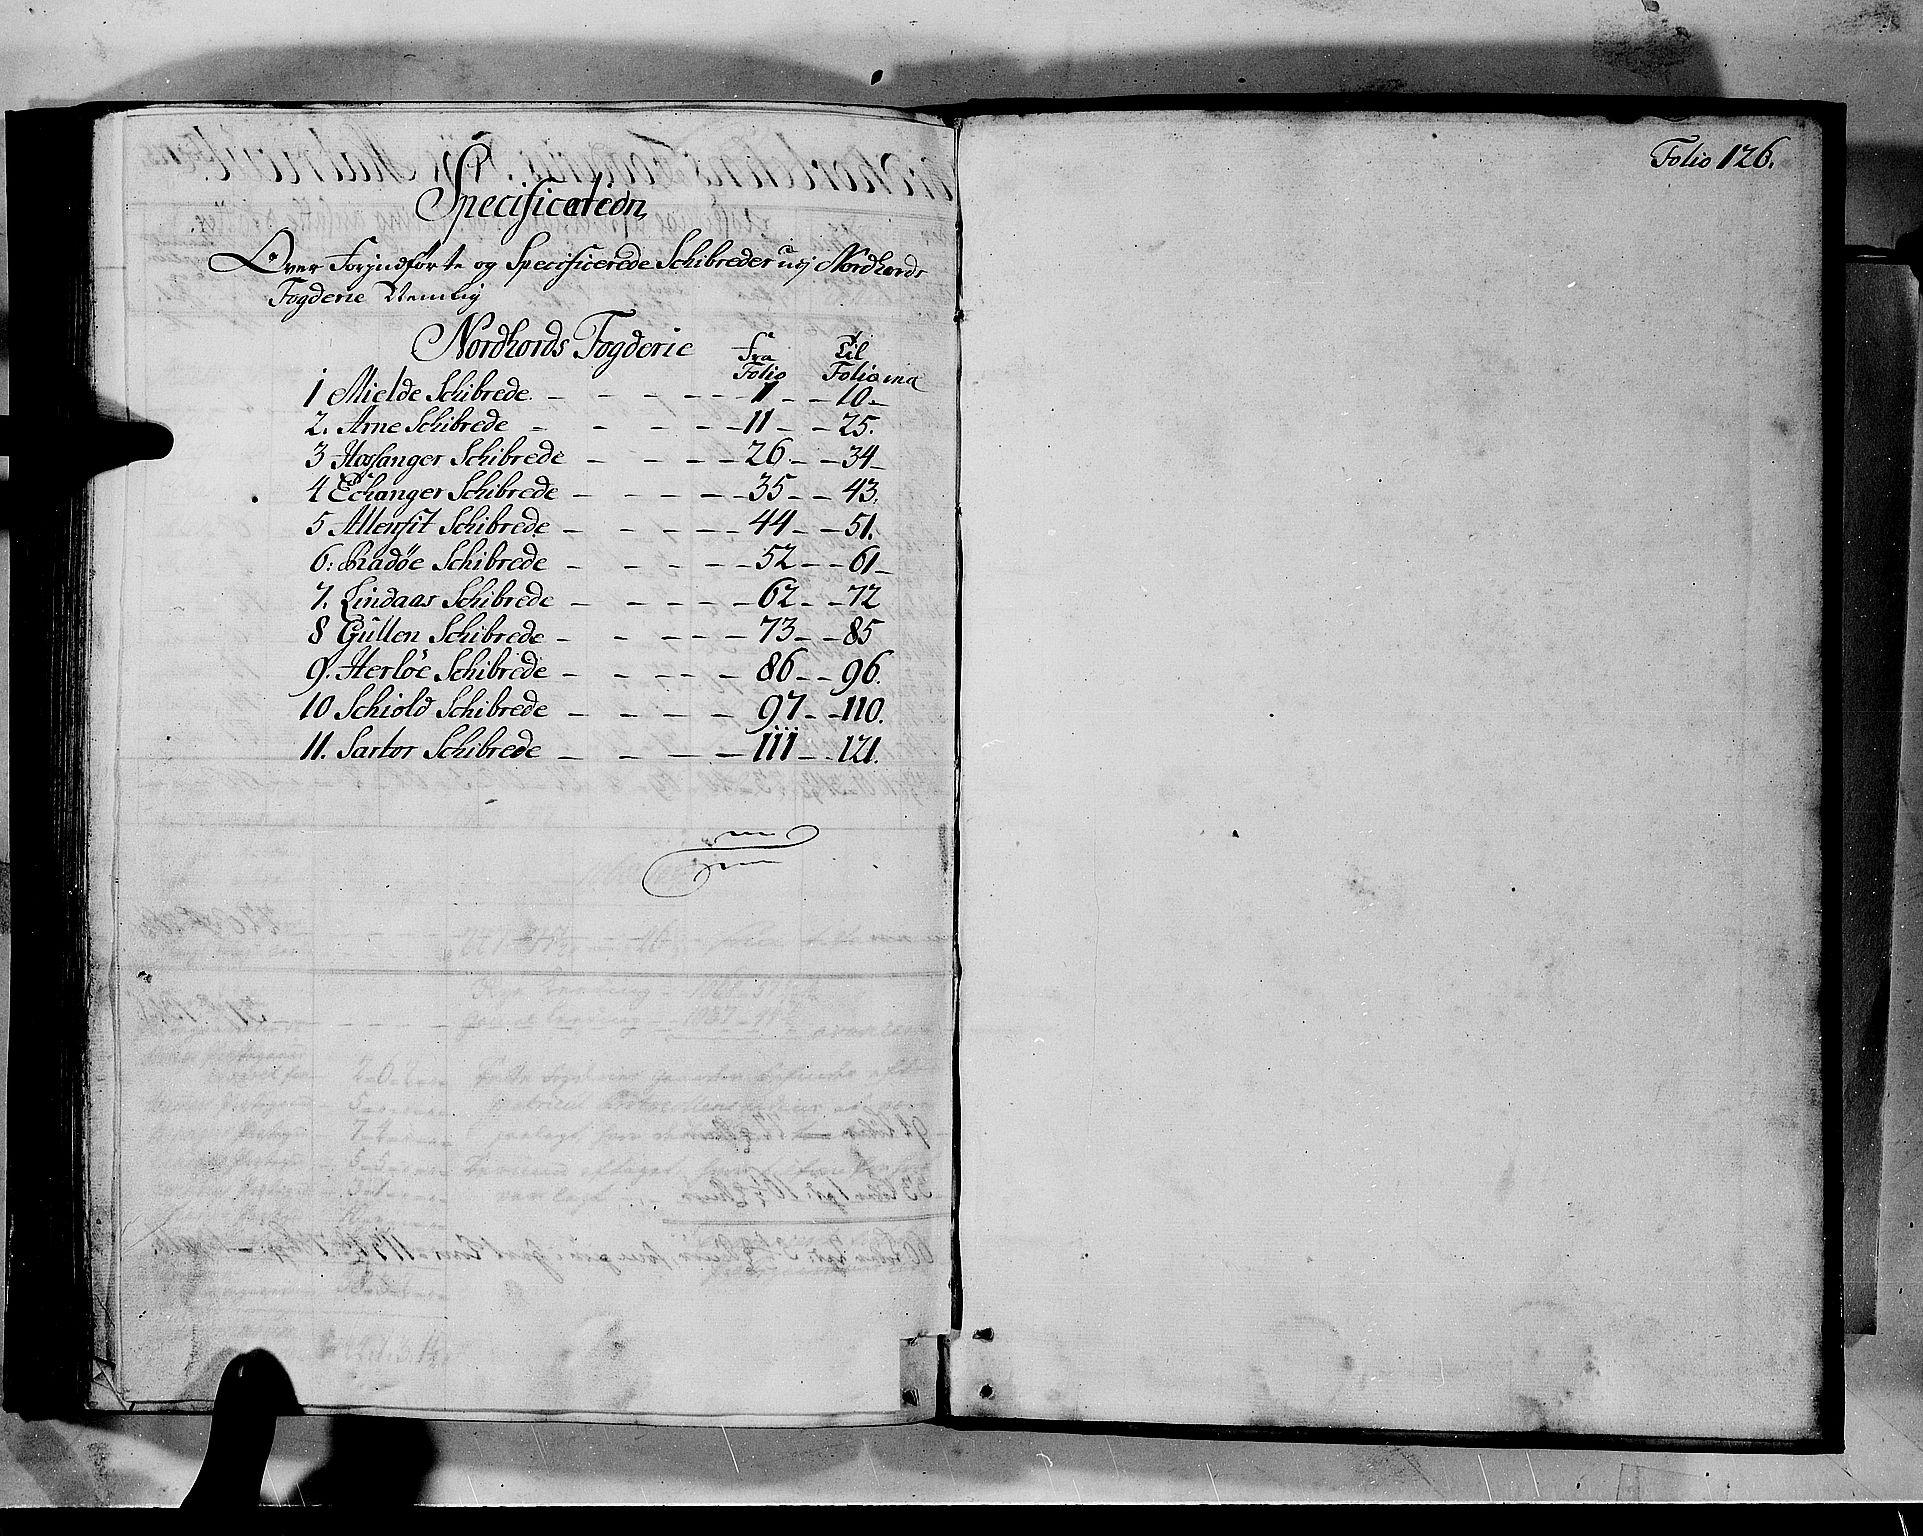 RA, Rentekammeret inntil 1814, Realistisk ordnet avdeling, N/Nb/Nbf/L0140: Nordhordland matrikkelprotokoll, 1723, s. 125b-126a